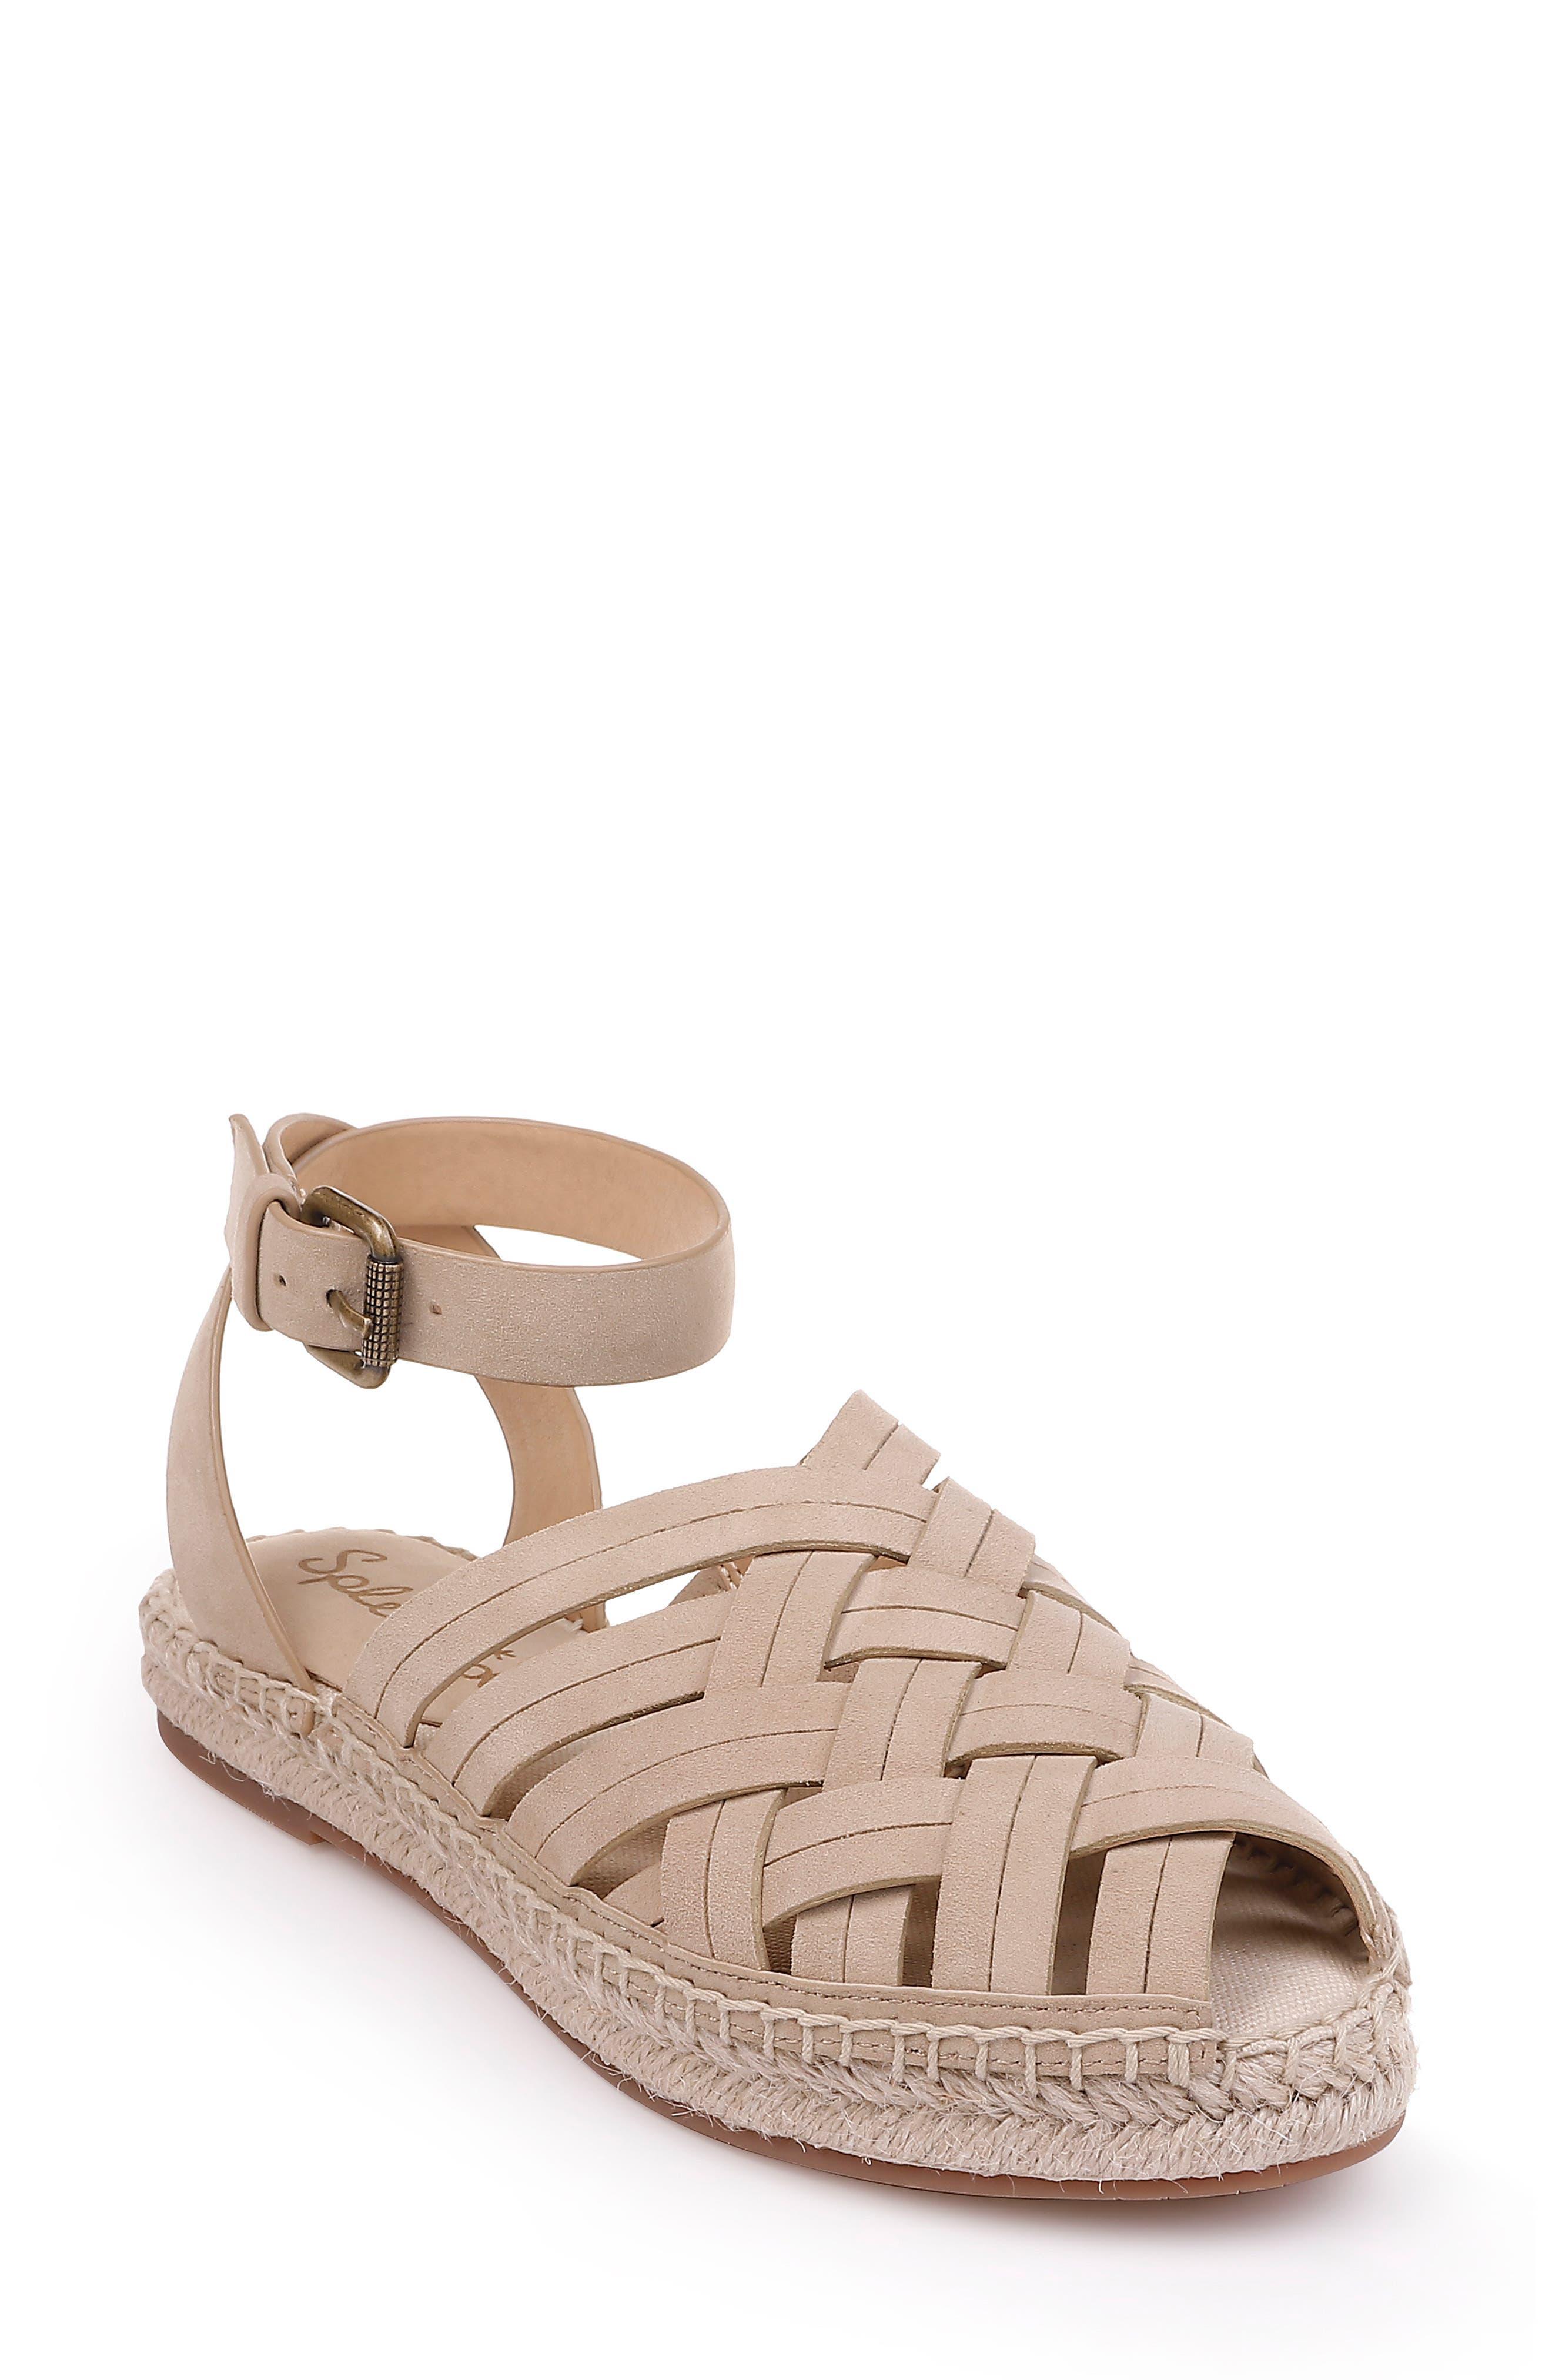 SPLENDID, Sheryl Espadrille Ankle Strap Sandal, Main thumbnail 1, color, MUSHROOM SUEDE